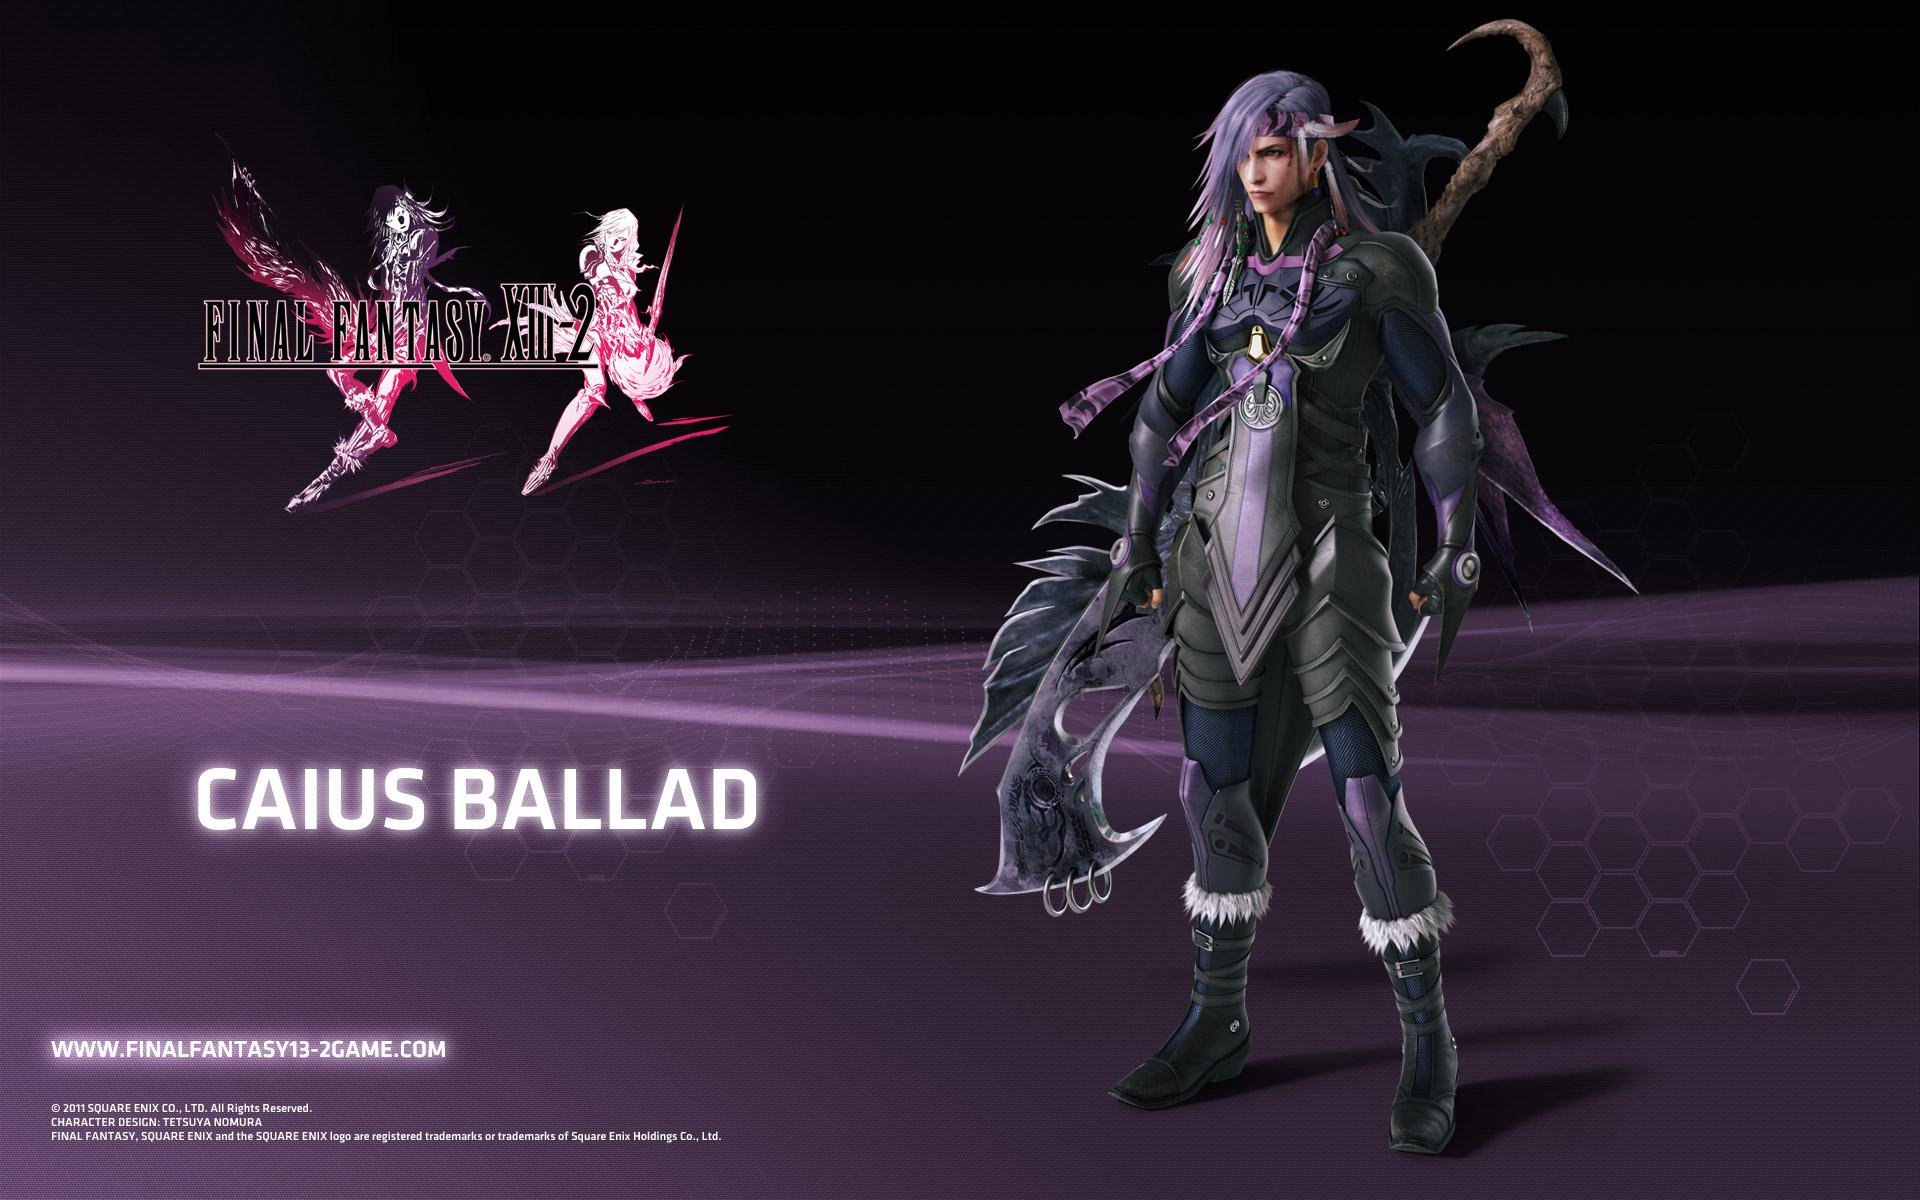 Final Fantasy 13 2 Wallpaper: Final Fantasy XIII-2 Caius Wallpaper